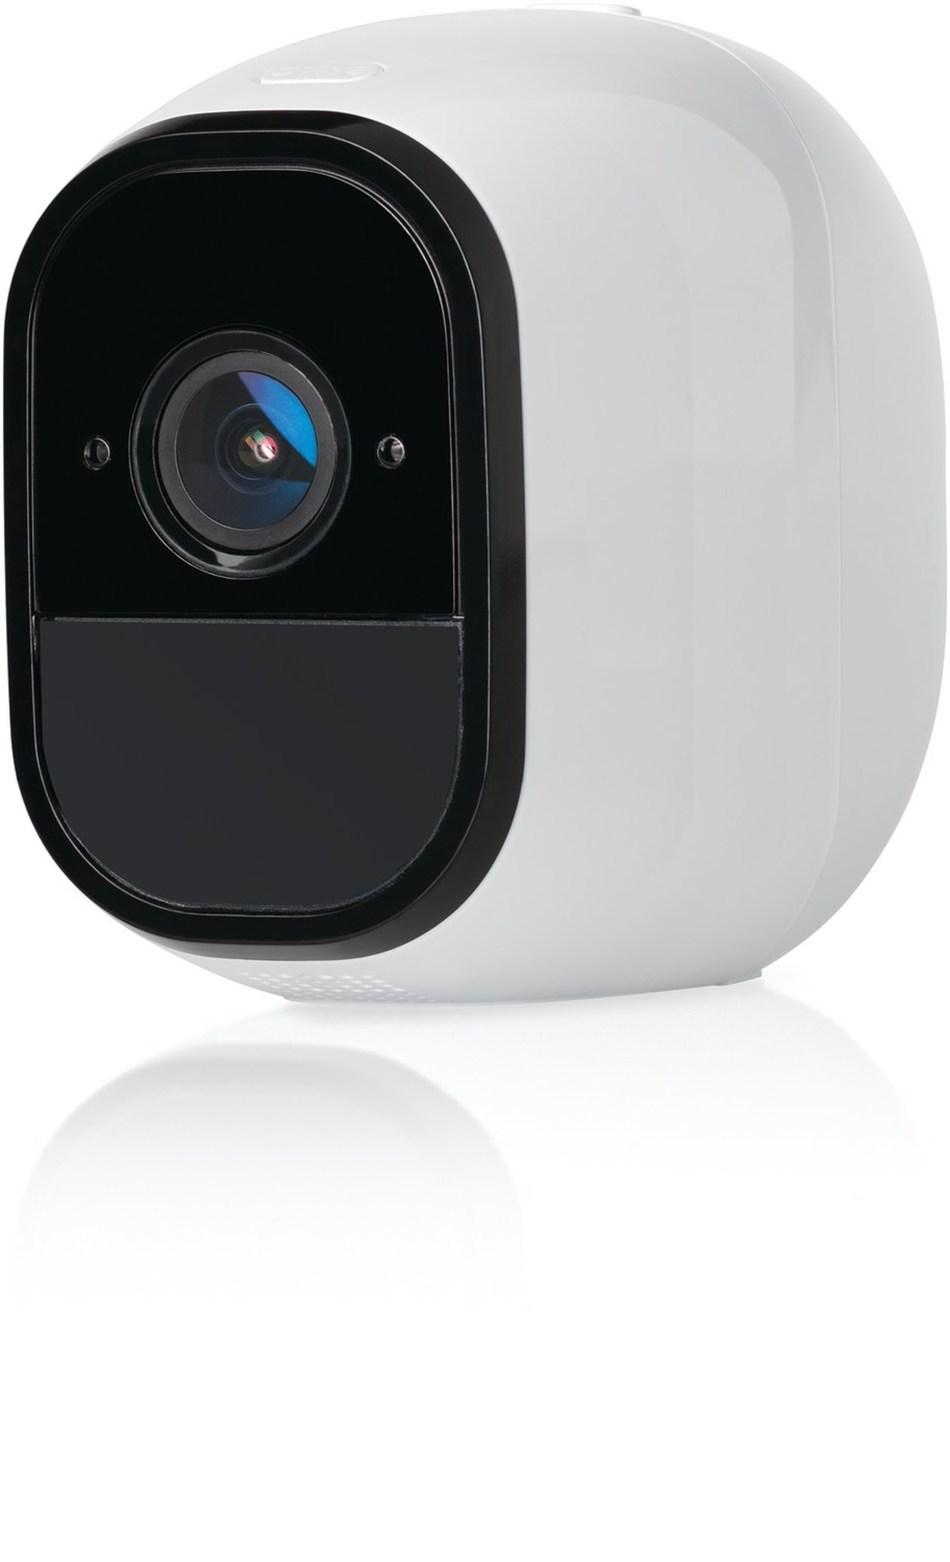 Arlo FlexPower Camera System